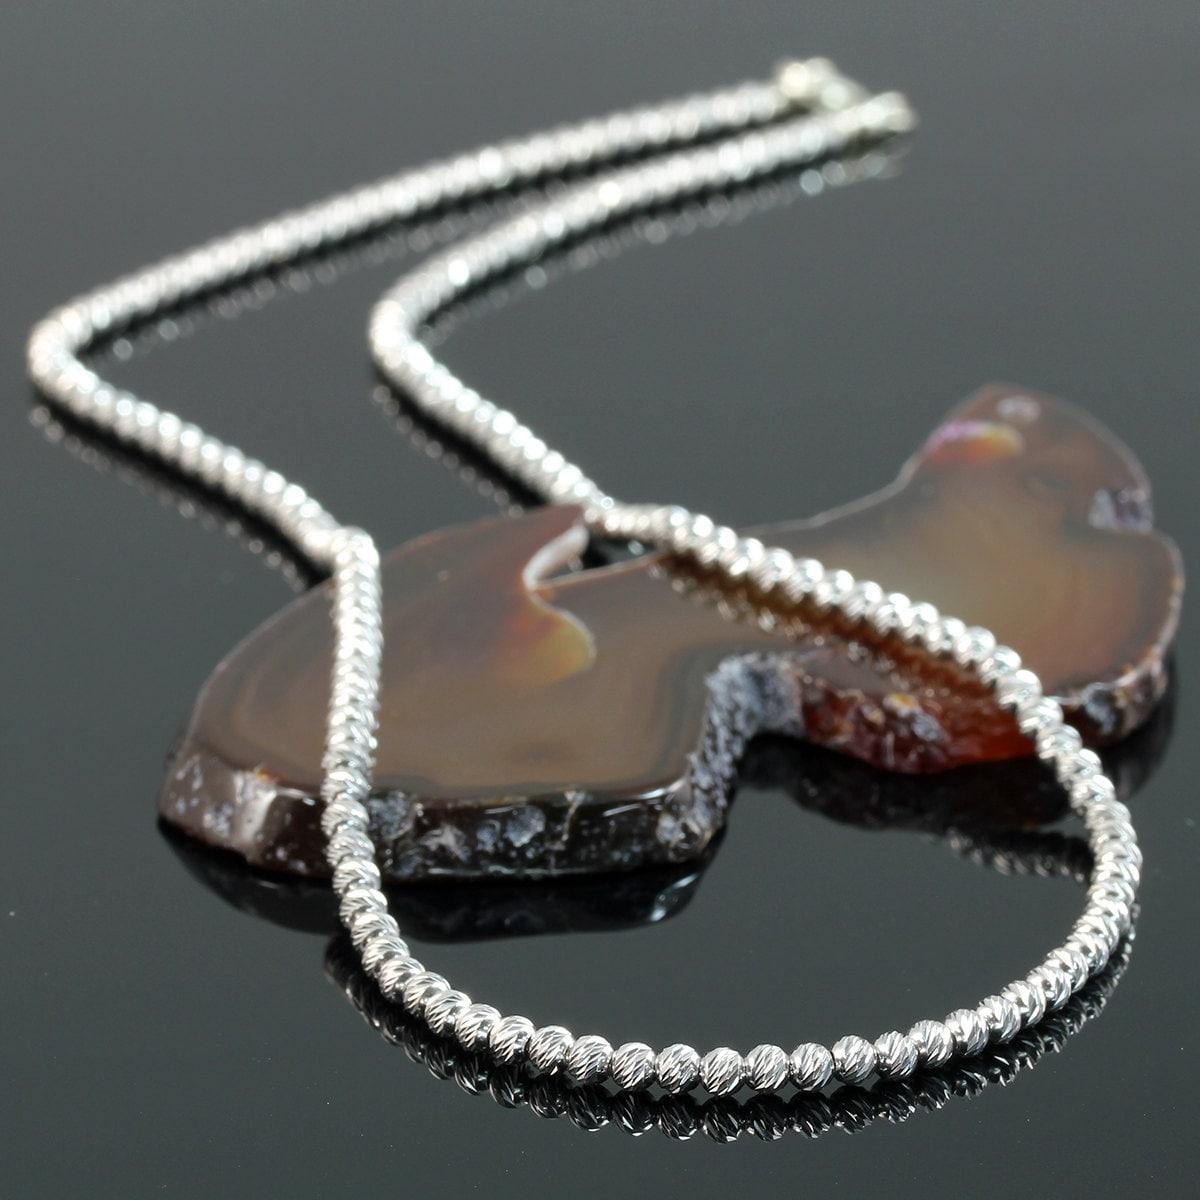 Beaded Diamond: Dazzling Beaded Silver Necklace Diamond Cut Beads Rhodium